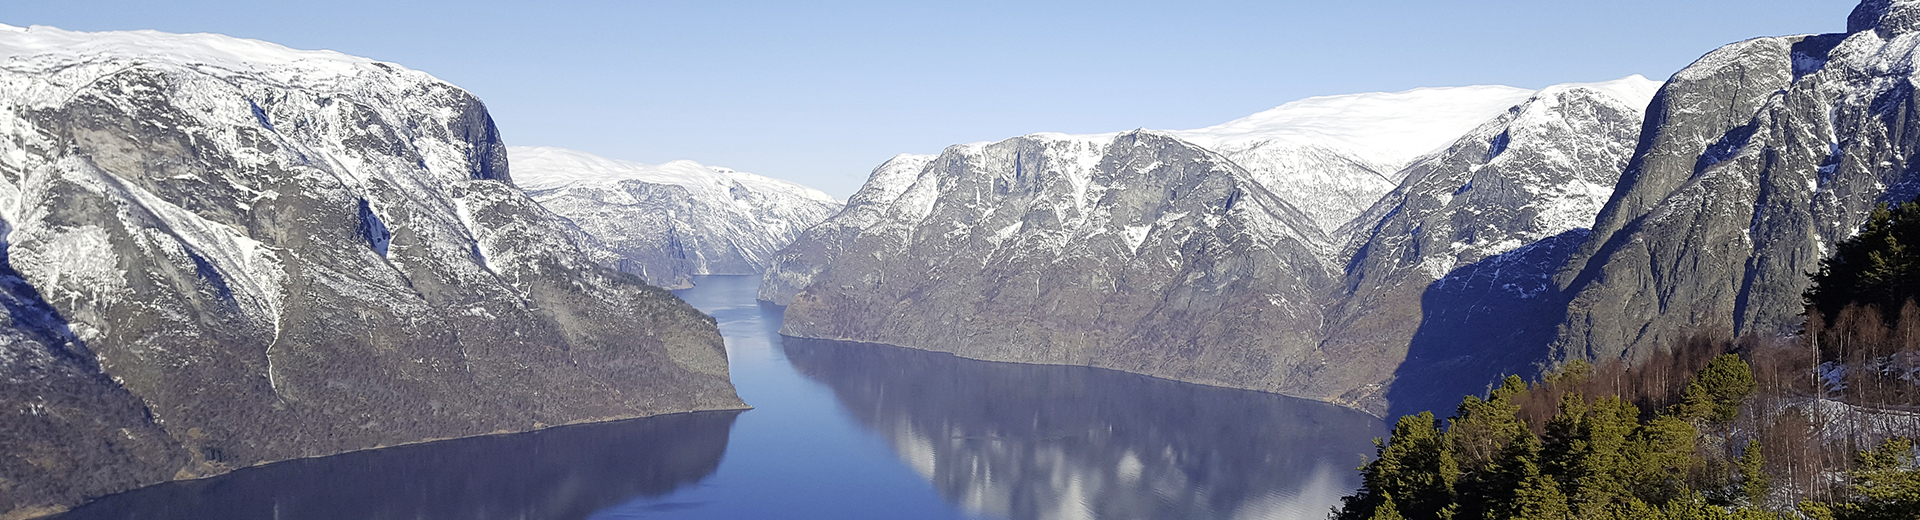 Trains des fjords en Norvège